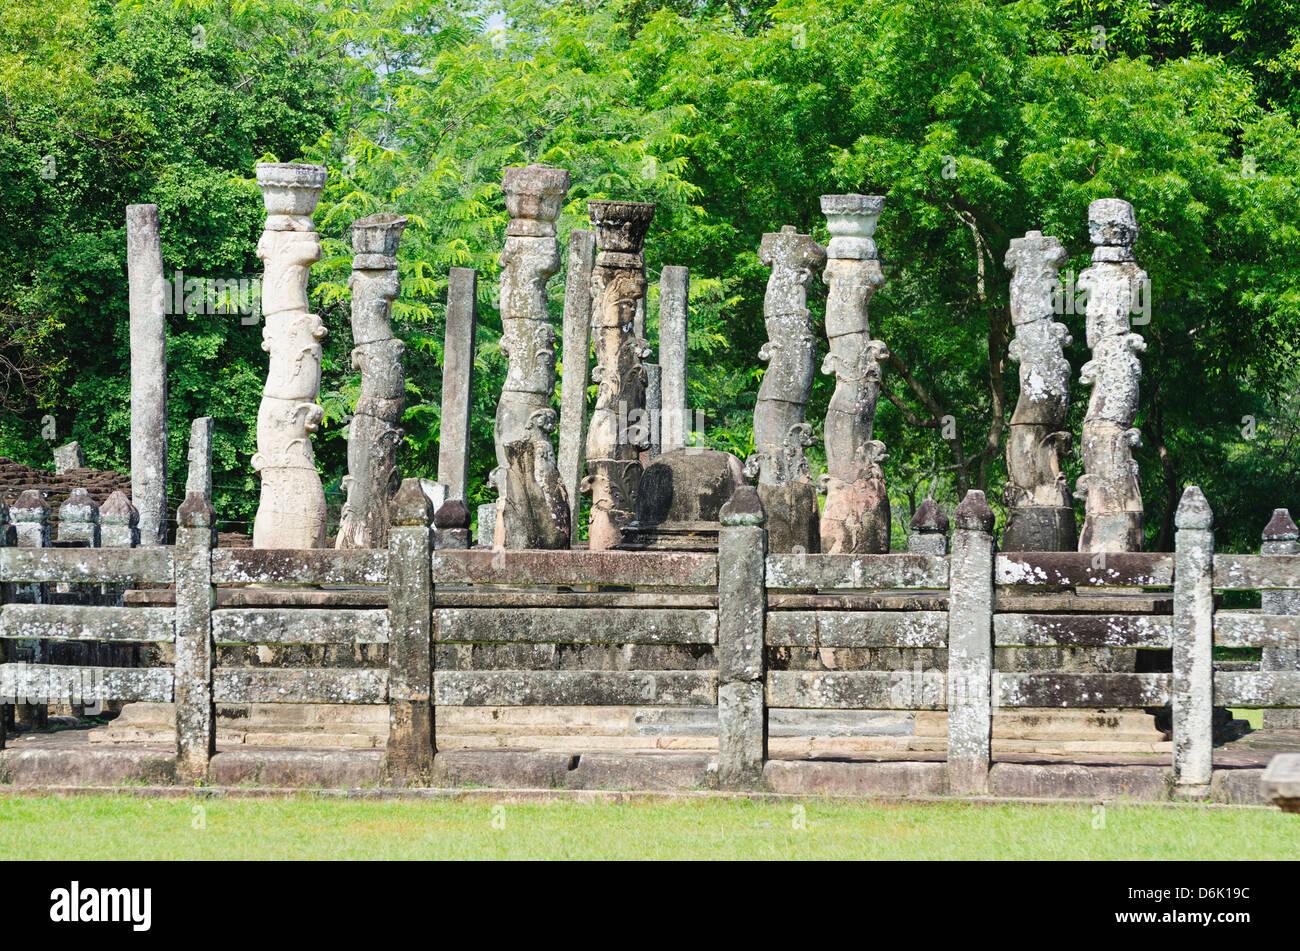 Vatadage, Quadrangle, Polonnaruwa, UNESCO World Heritage Site, North Central Province, Sri Lanka, Asia - Stock Image